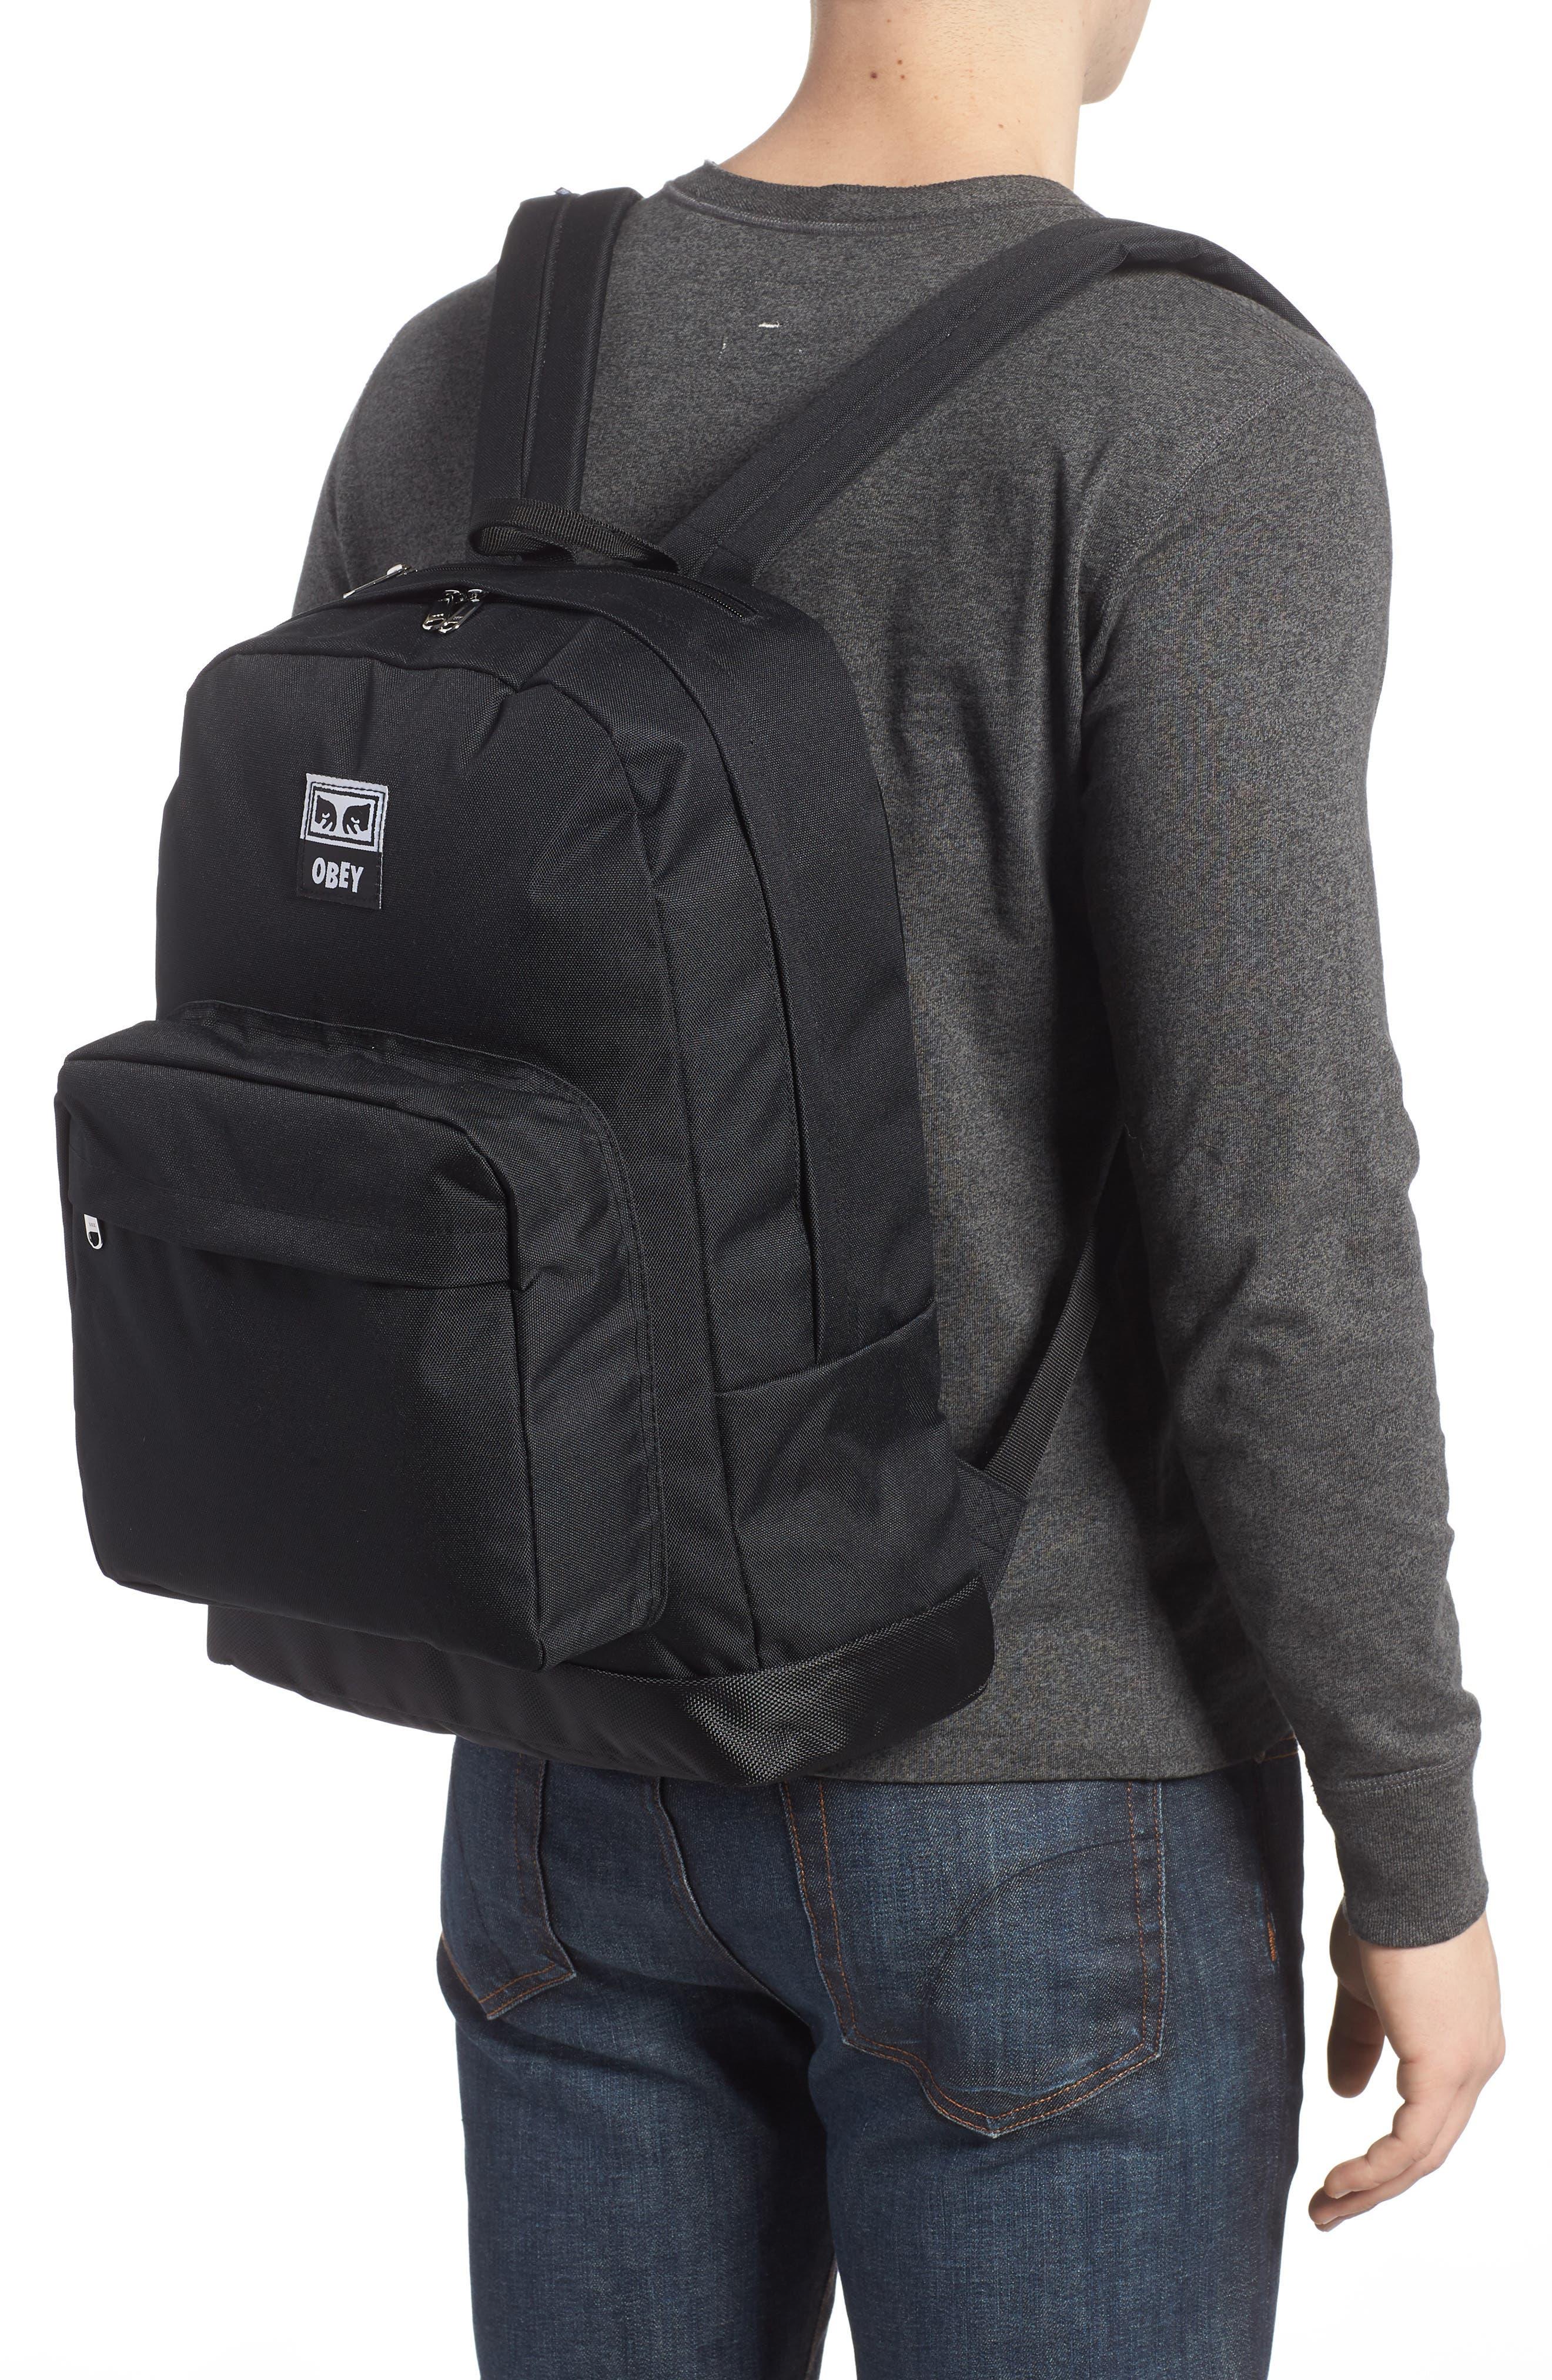 Drop Out Juvee Backpack,                             Alternate thumbnail 2, color,                             Black